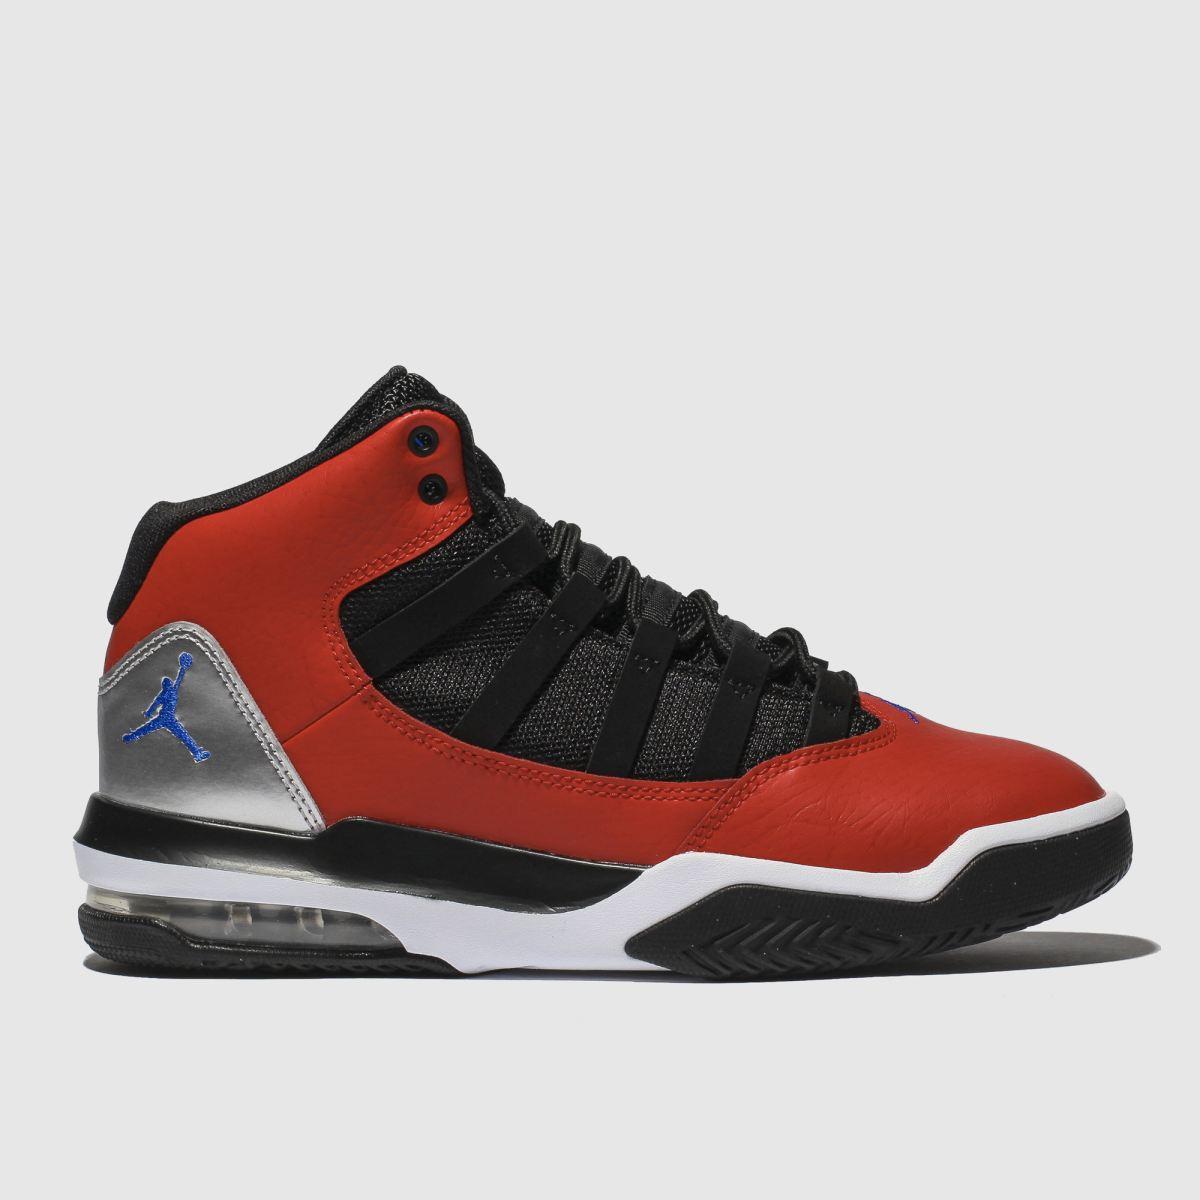 Nike Jordan Black & Red Max Aura Trainers Youth